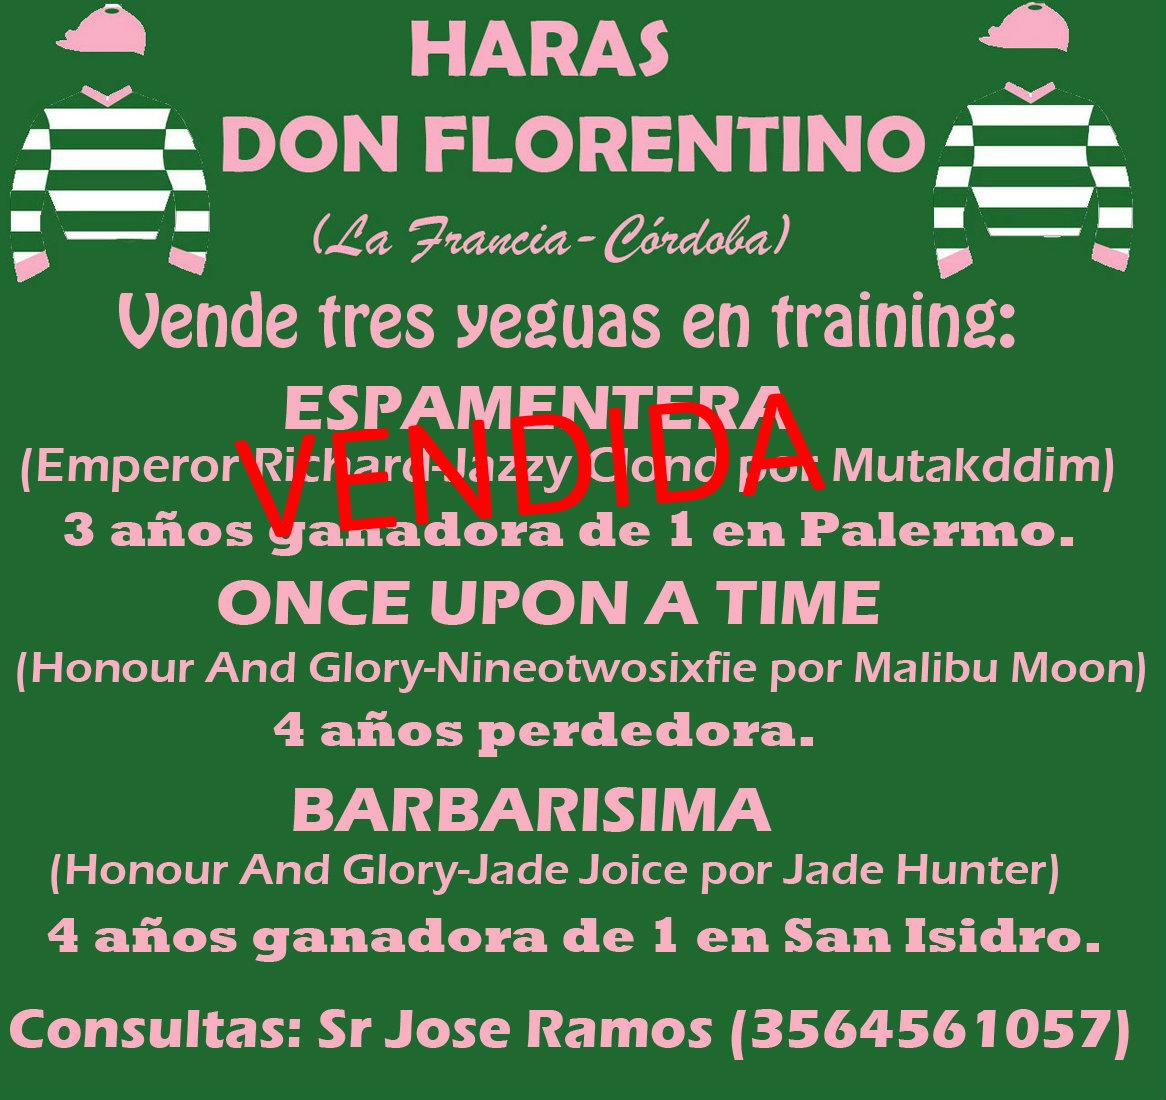 HS DON FLORENTINO 1